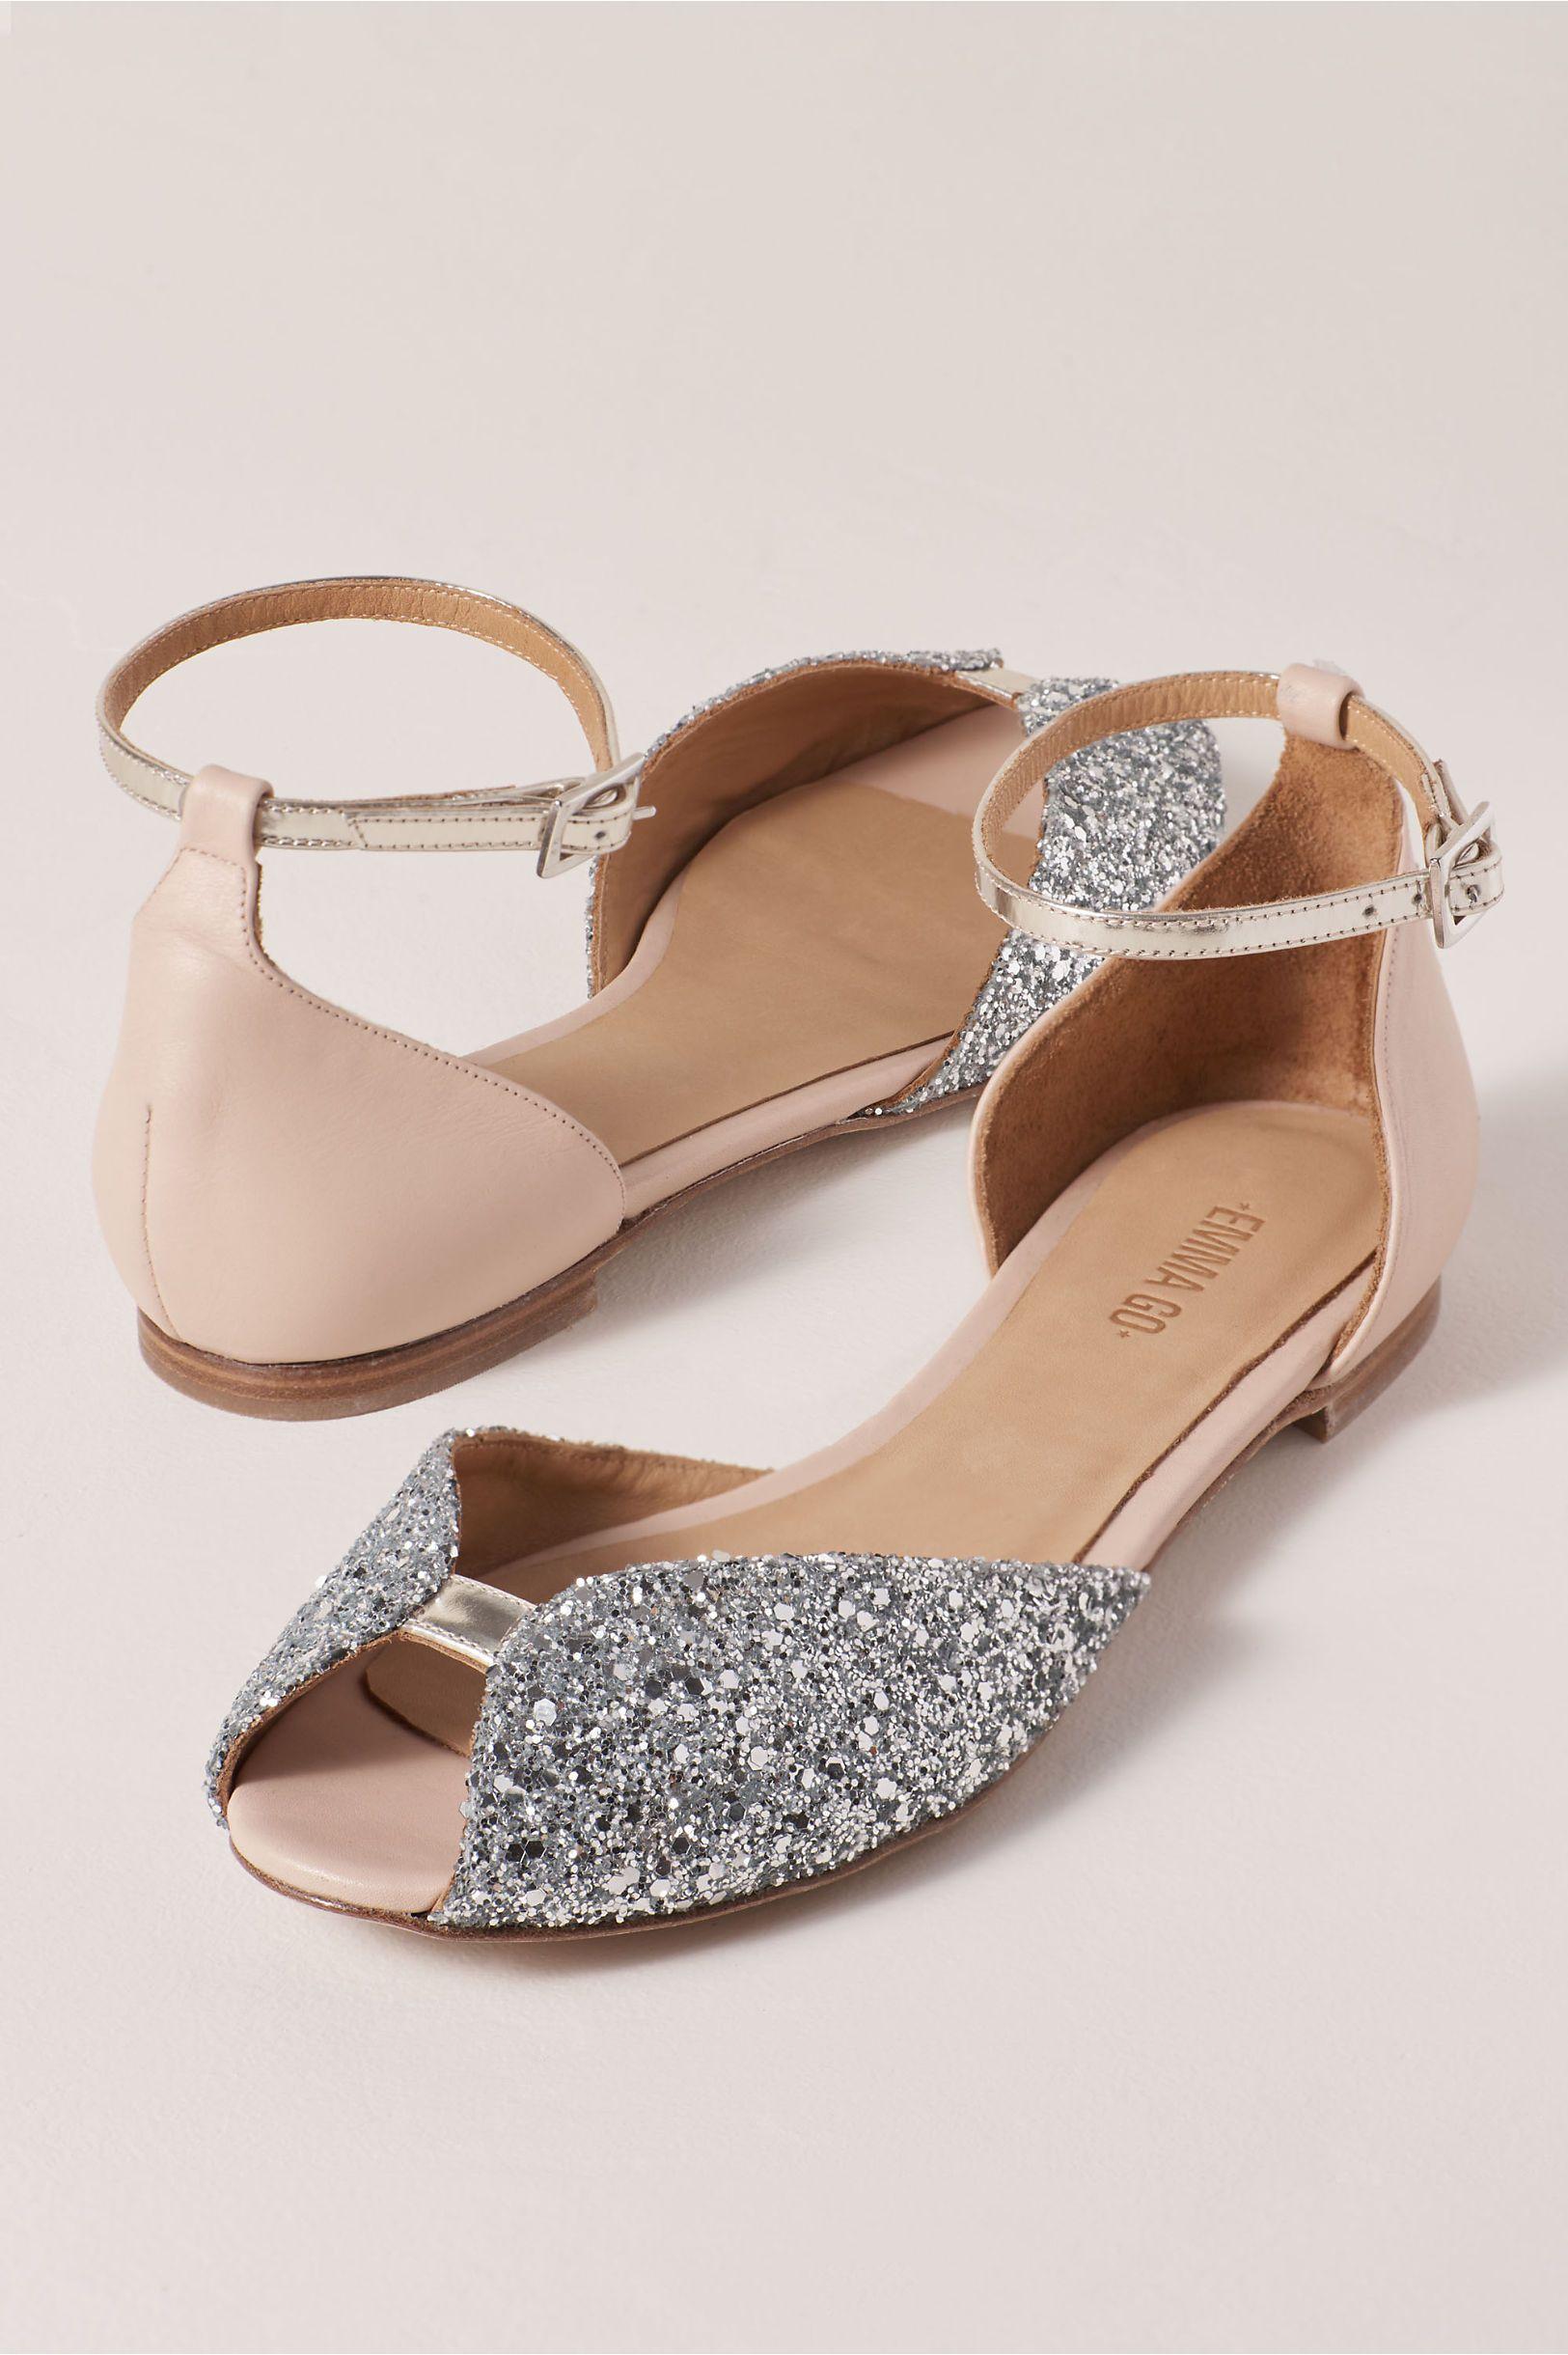 Emma Go Juliette Flats In Almond Size: 41 Eu   Bride shoes